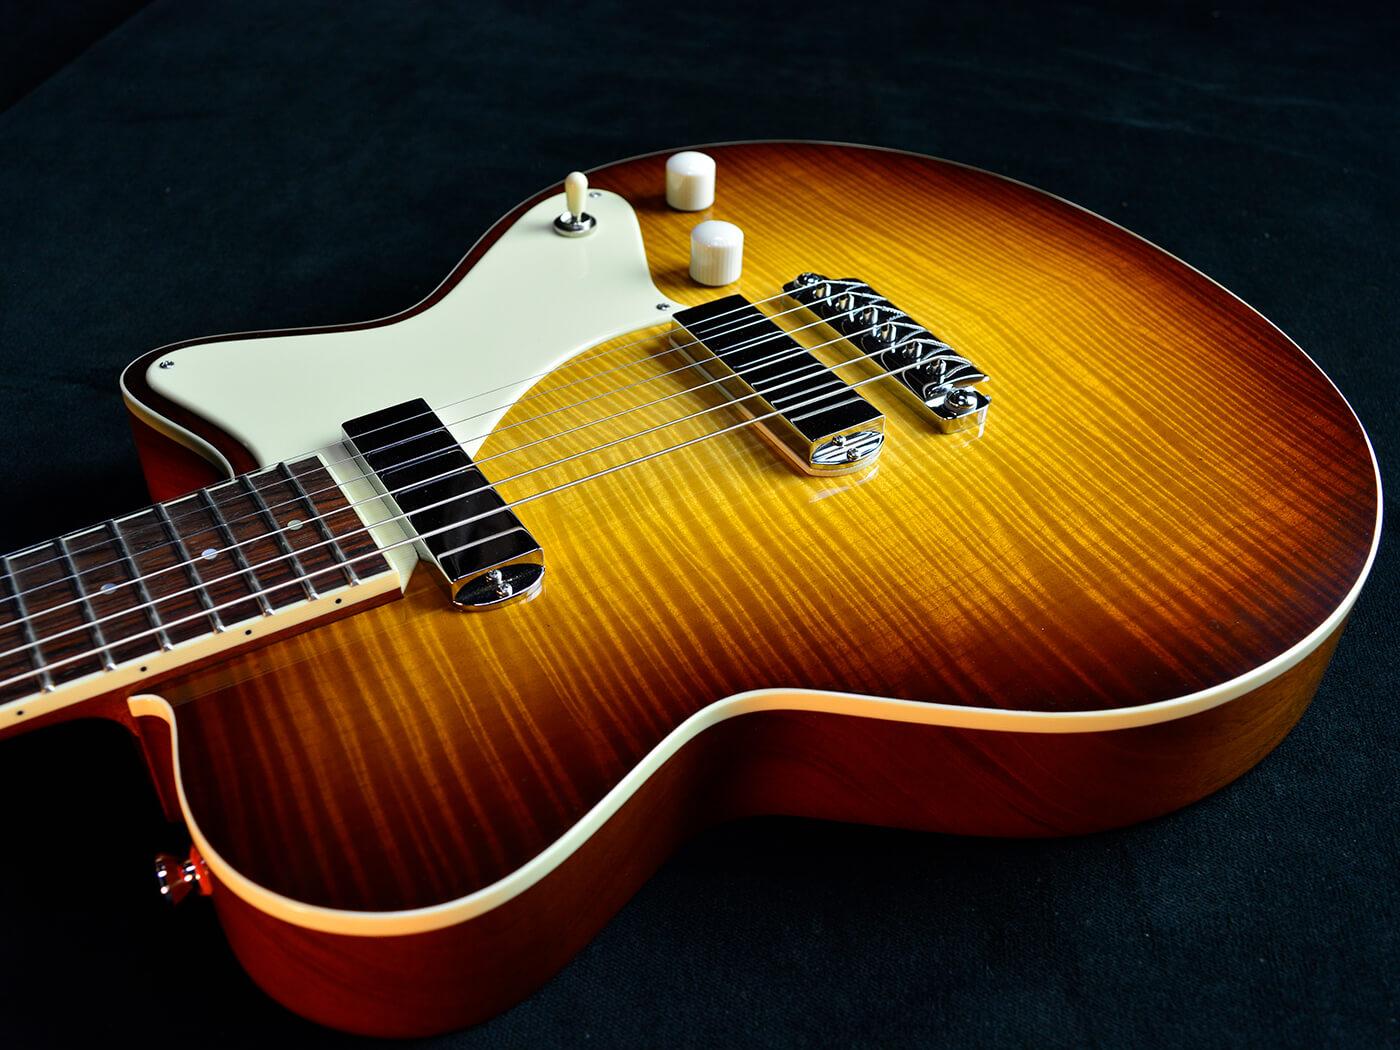 Joe Yanuziello's 50s Harmony/Silvertone Stratotone